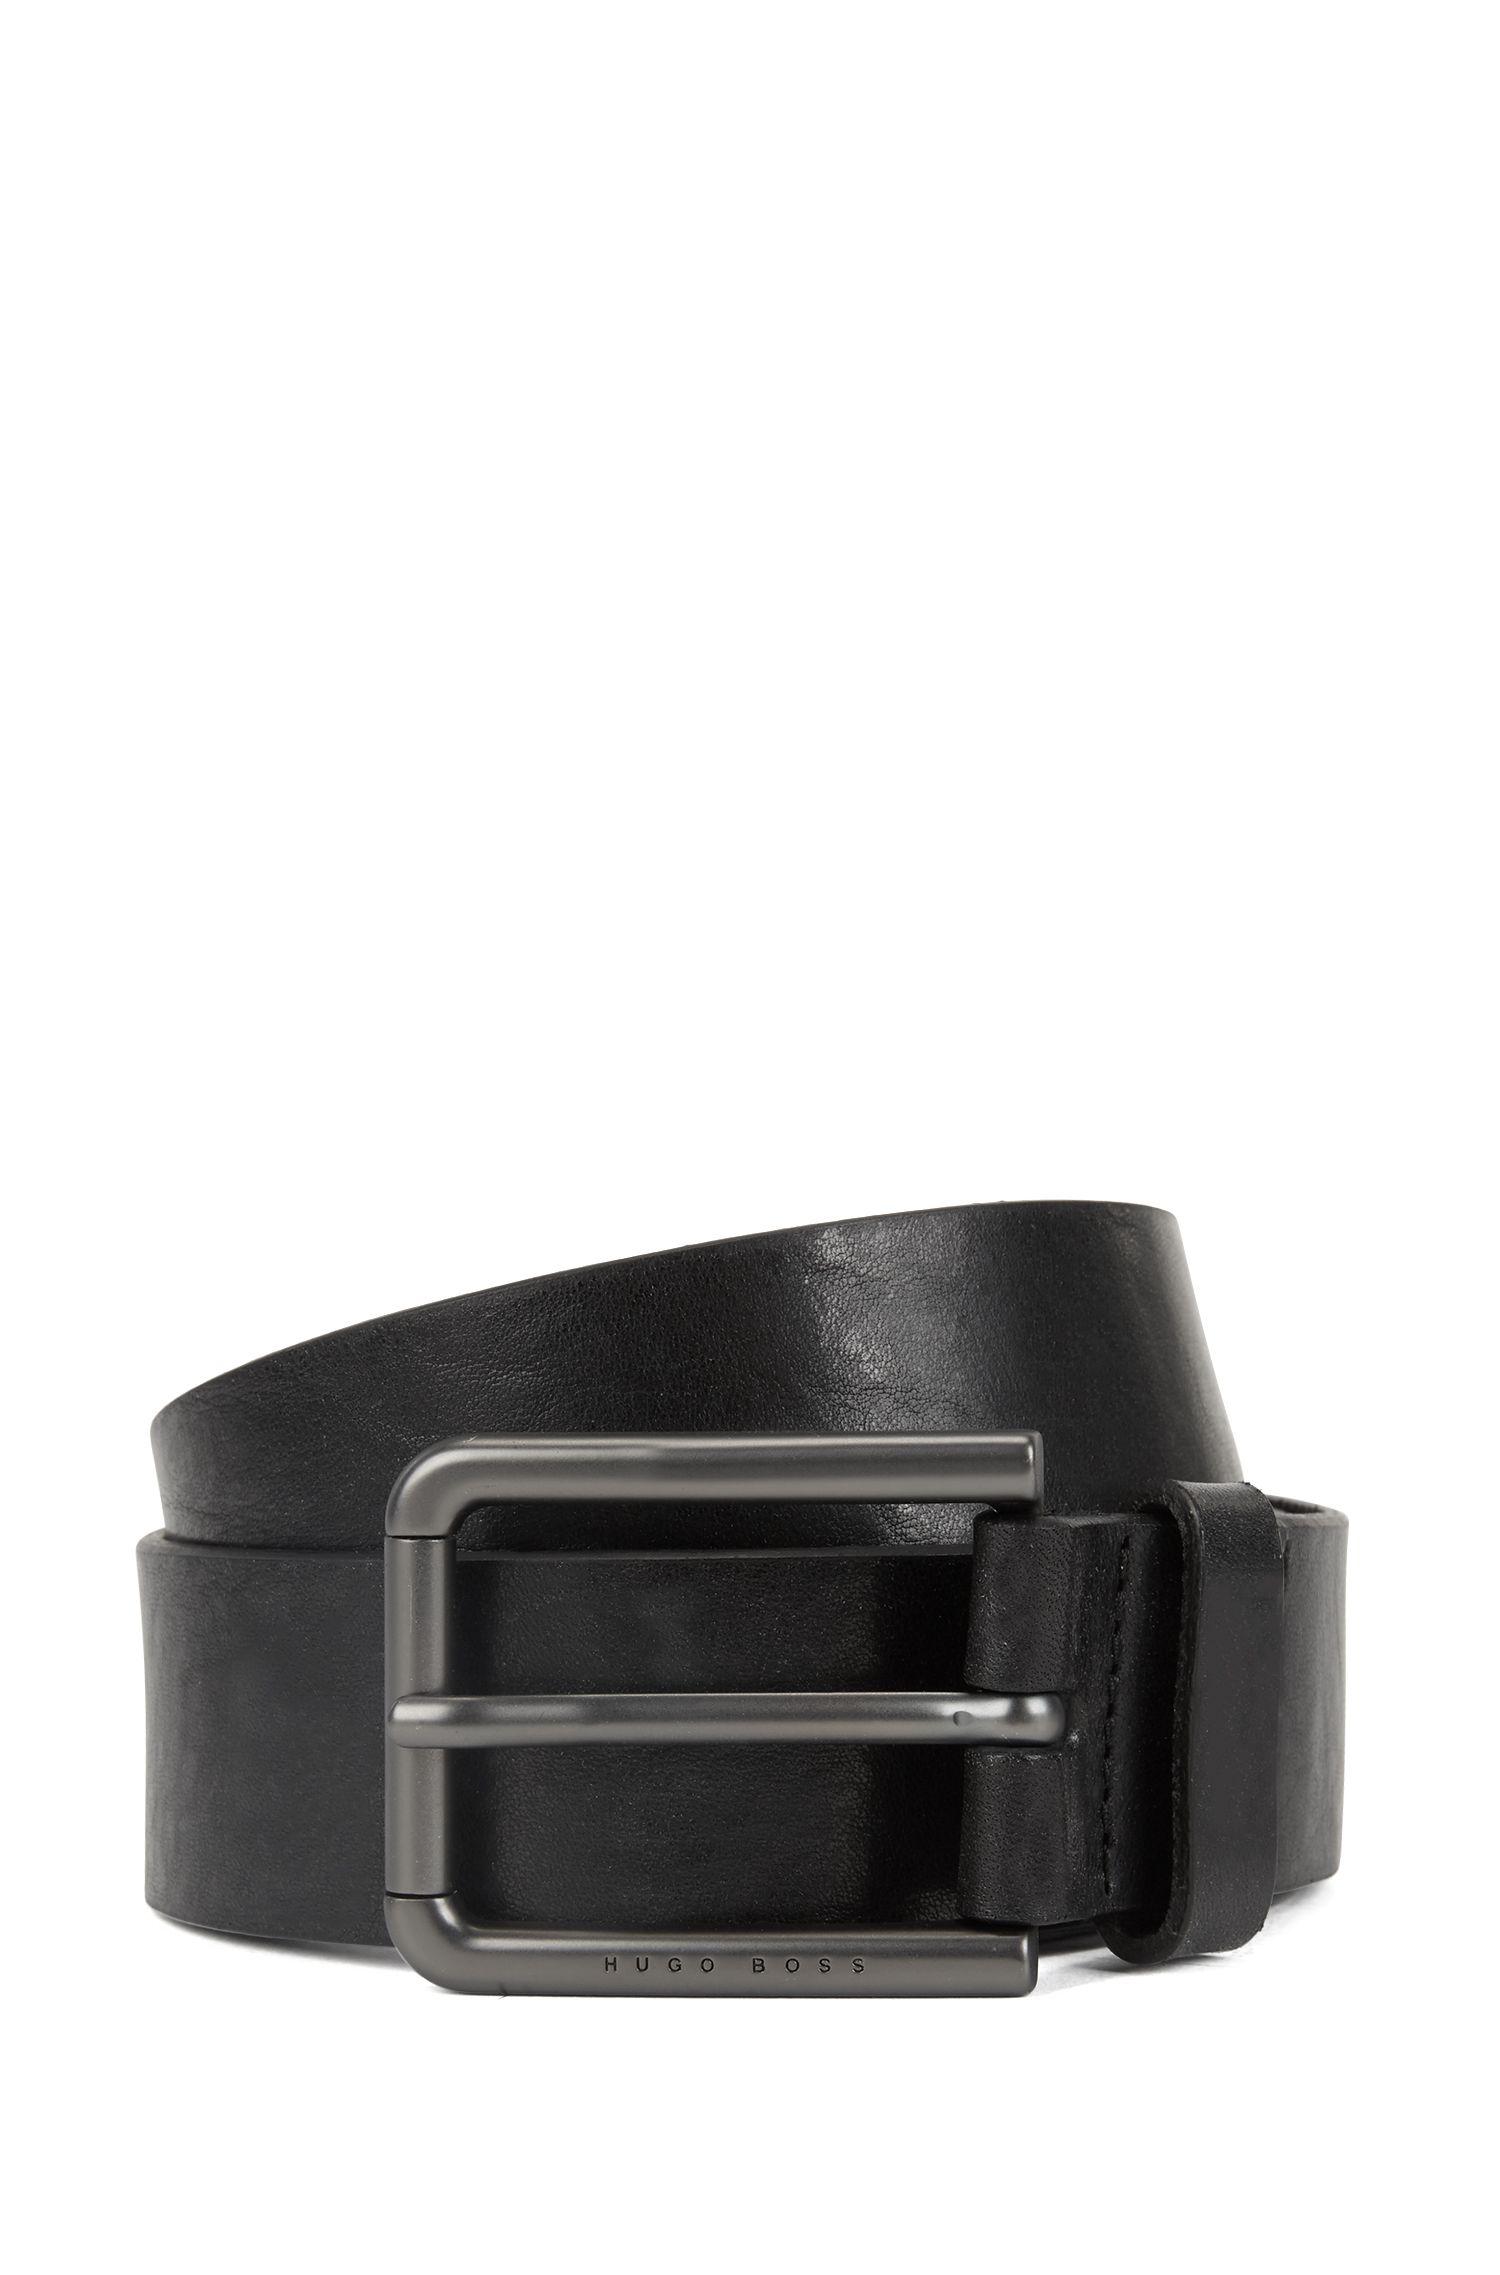 Italian leather belt with gunmetal roller buckle, Black